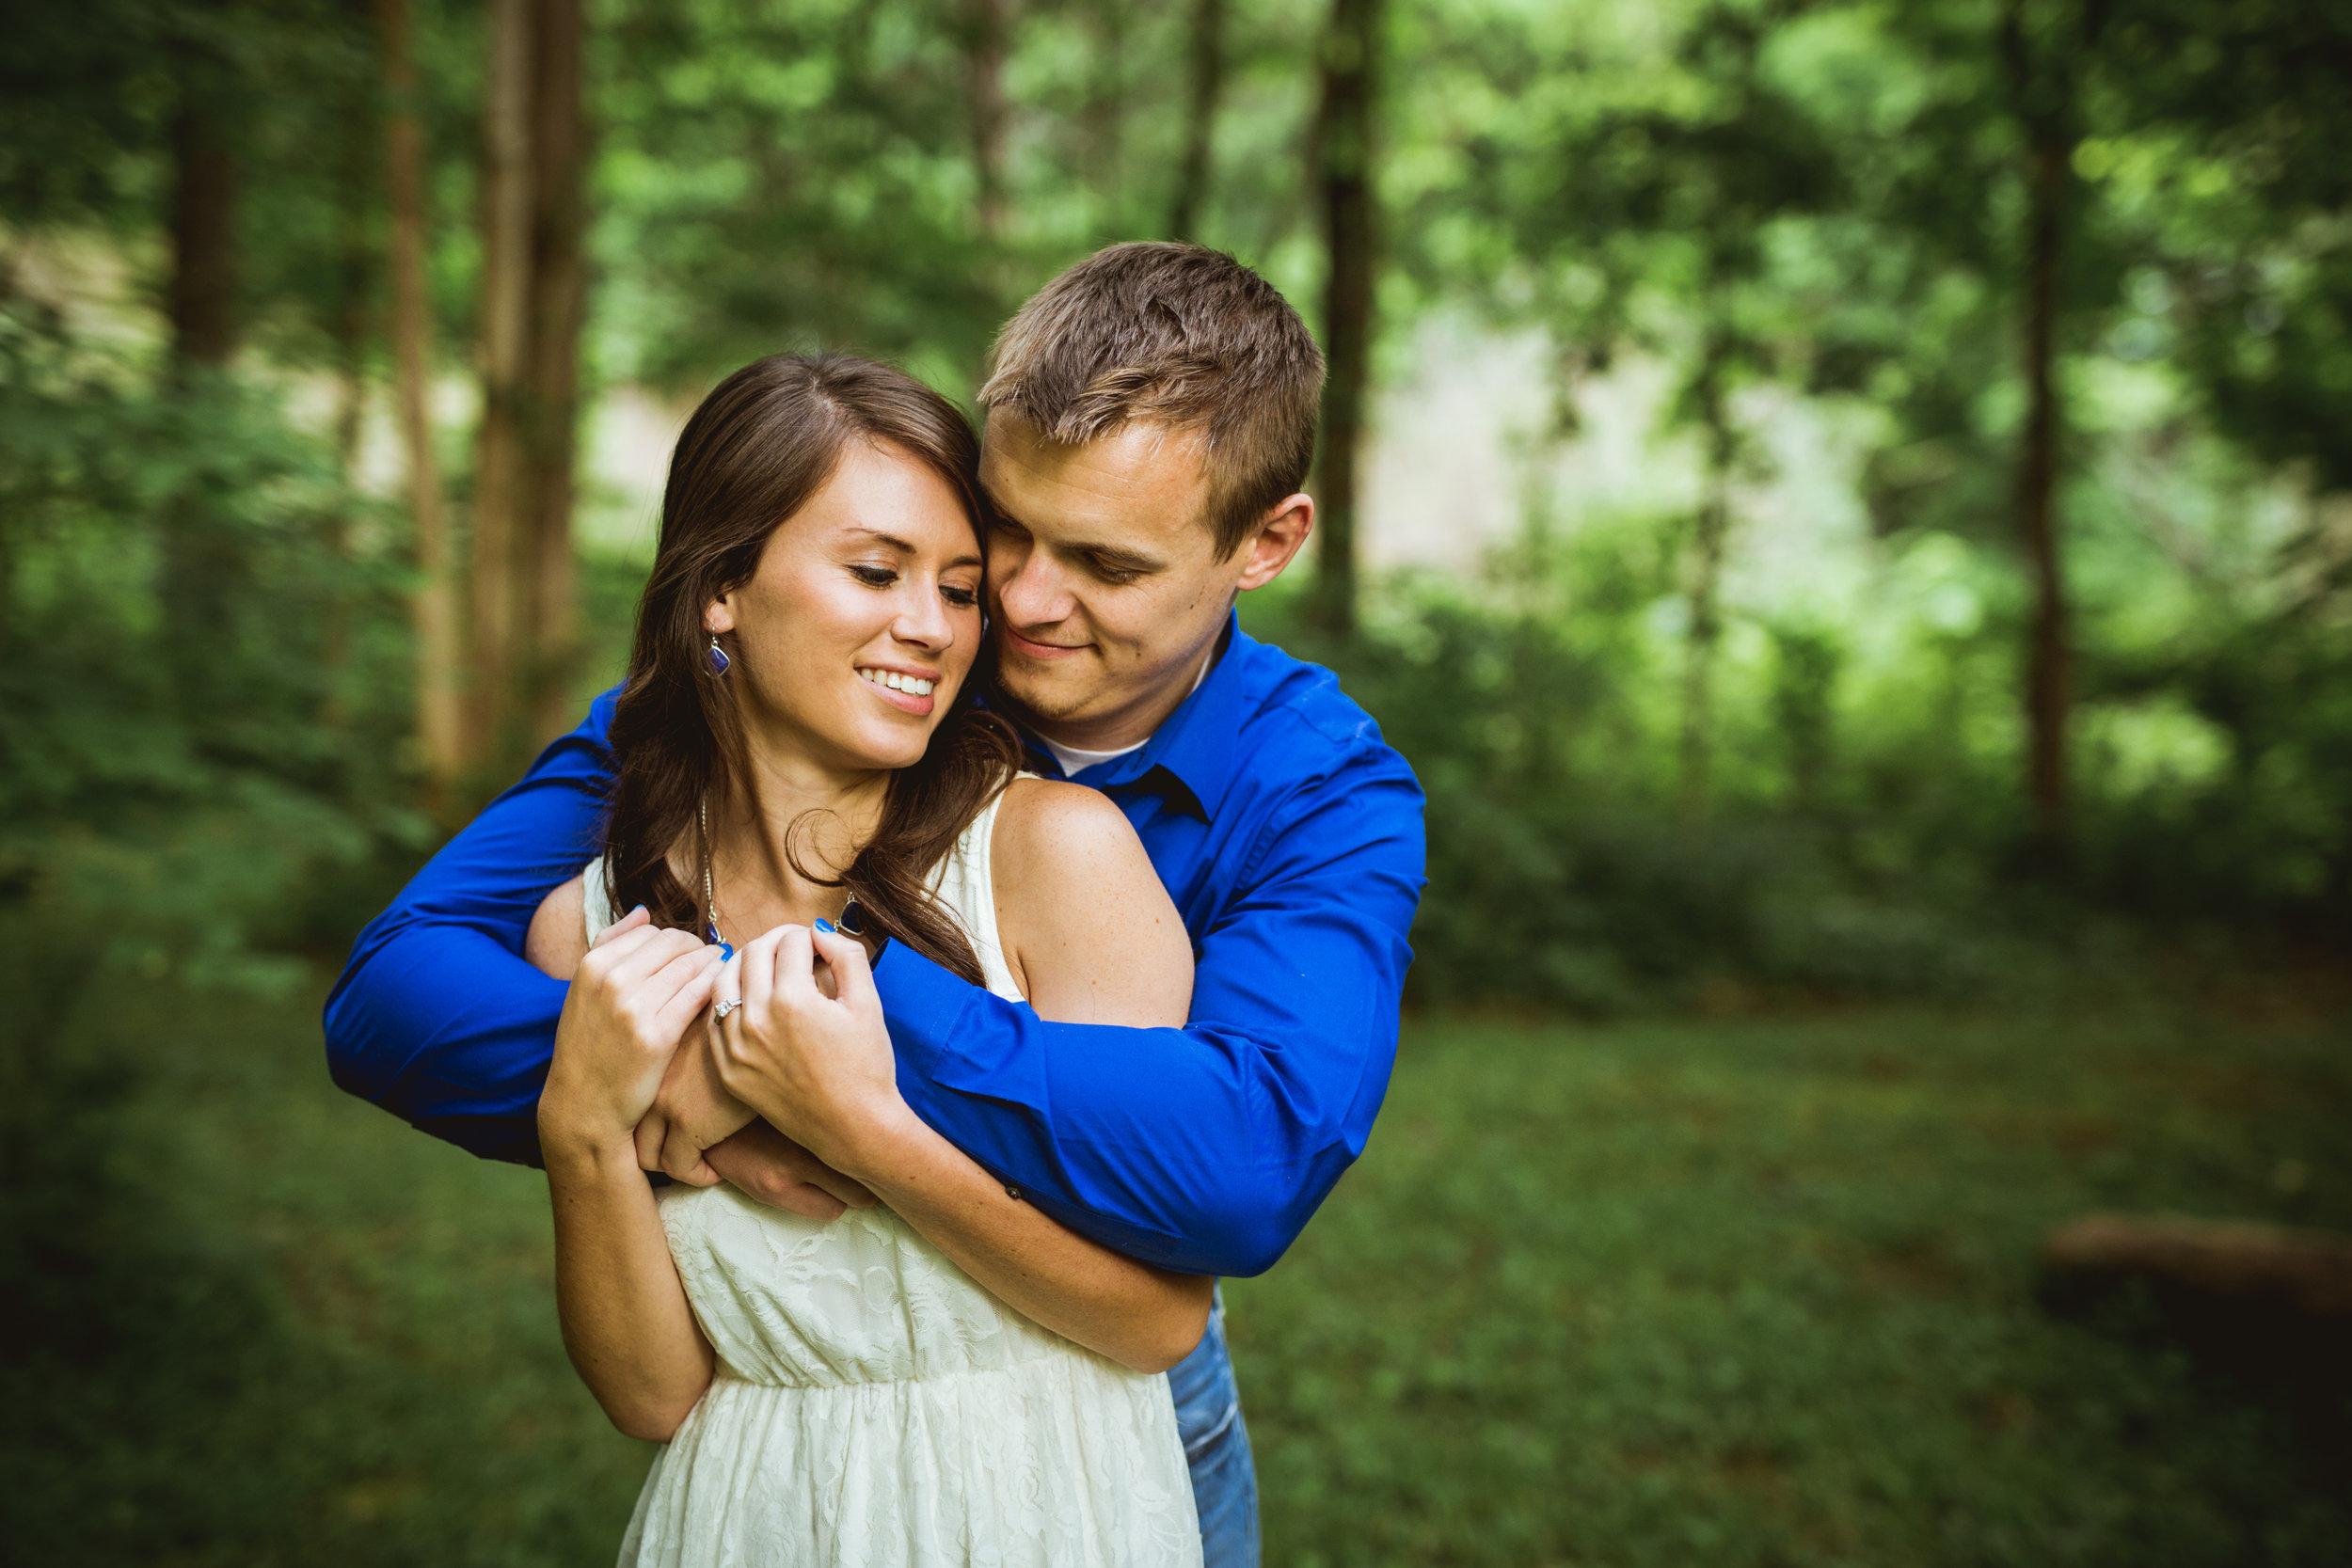 Todd-Hunt Engagement-29.jpg